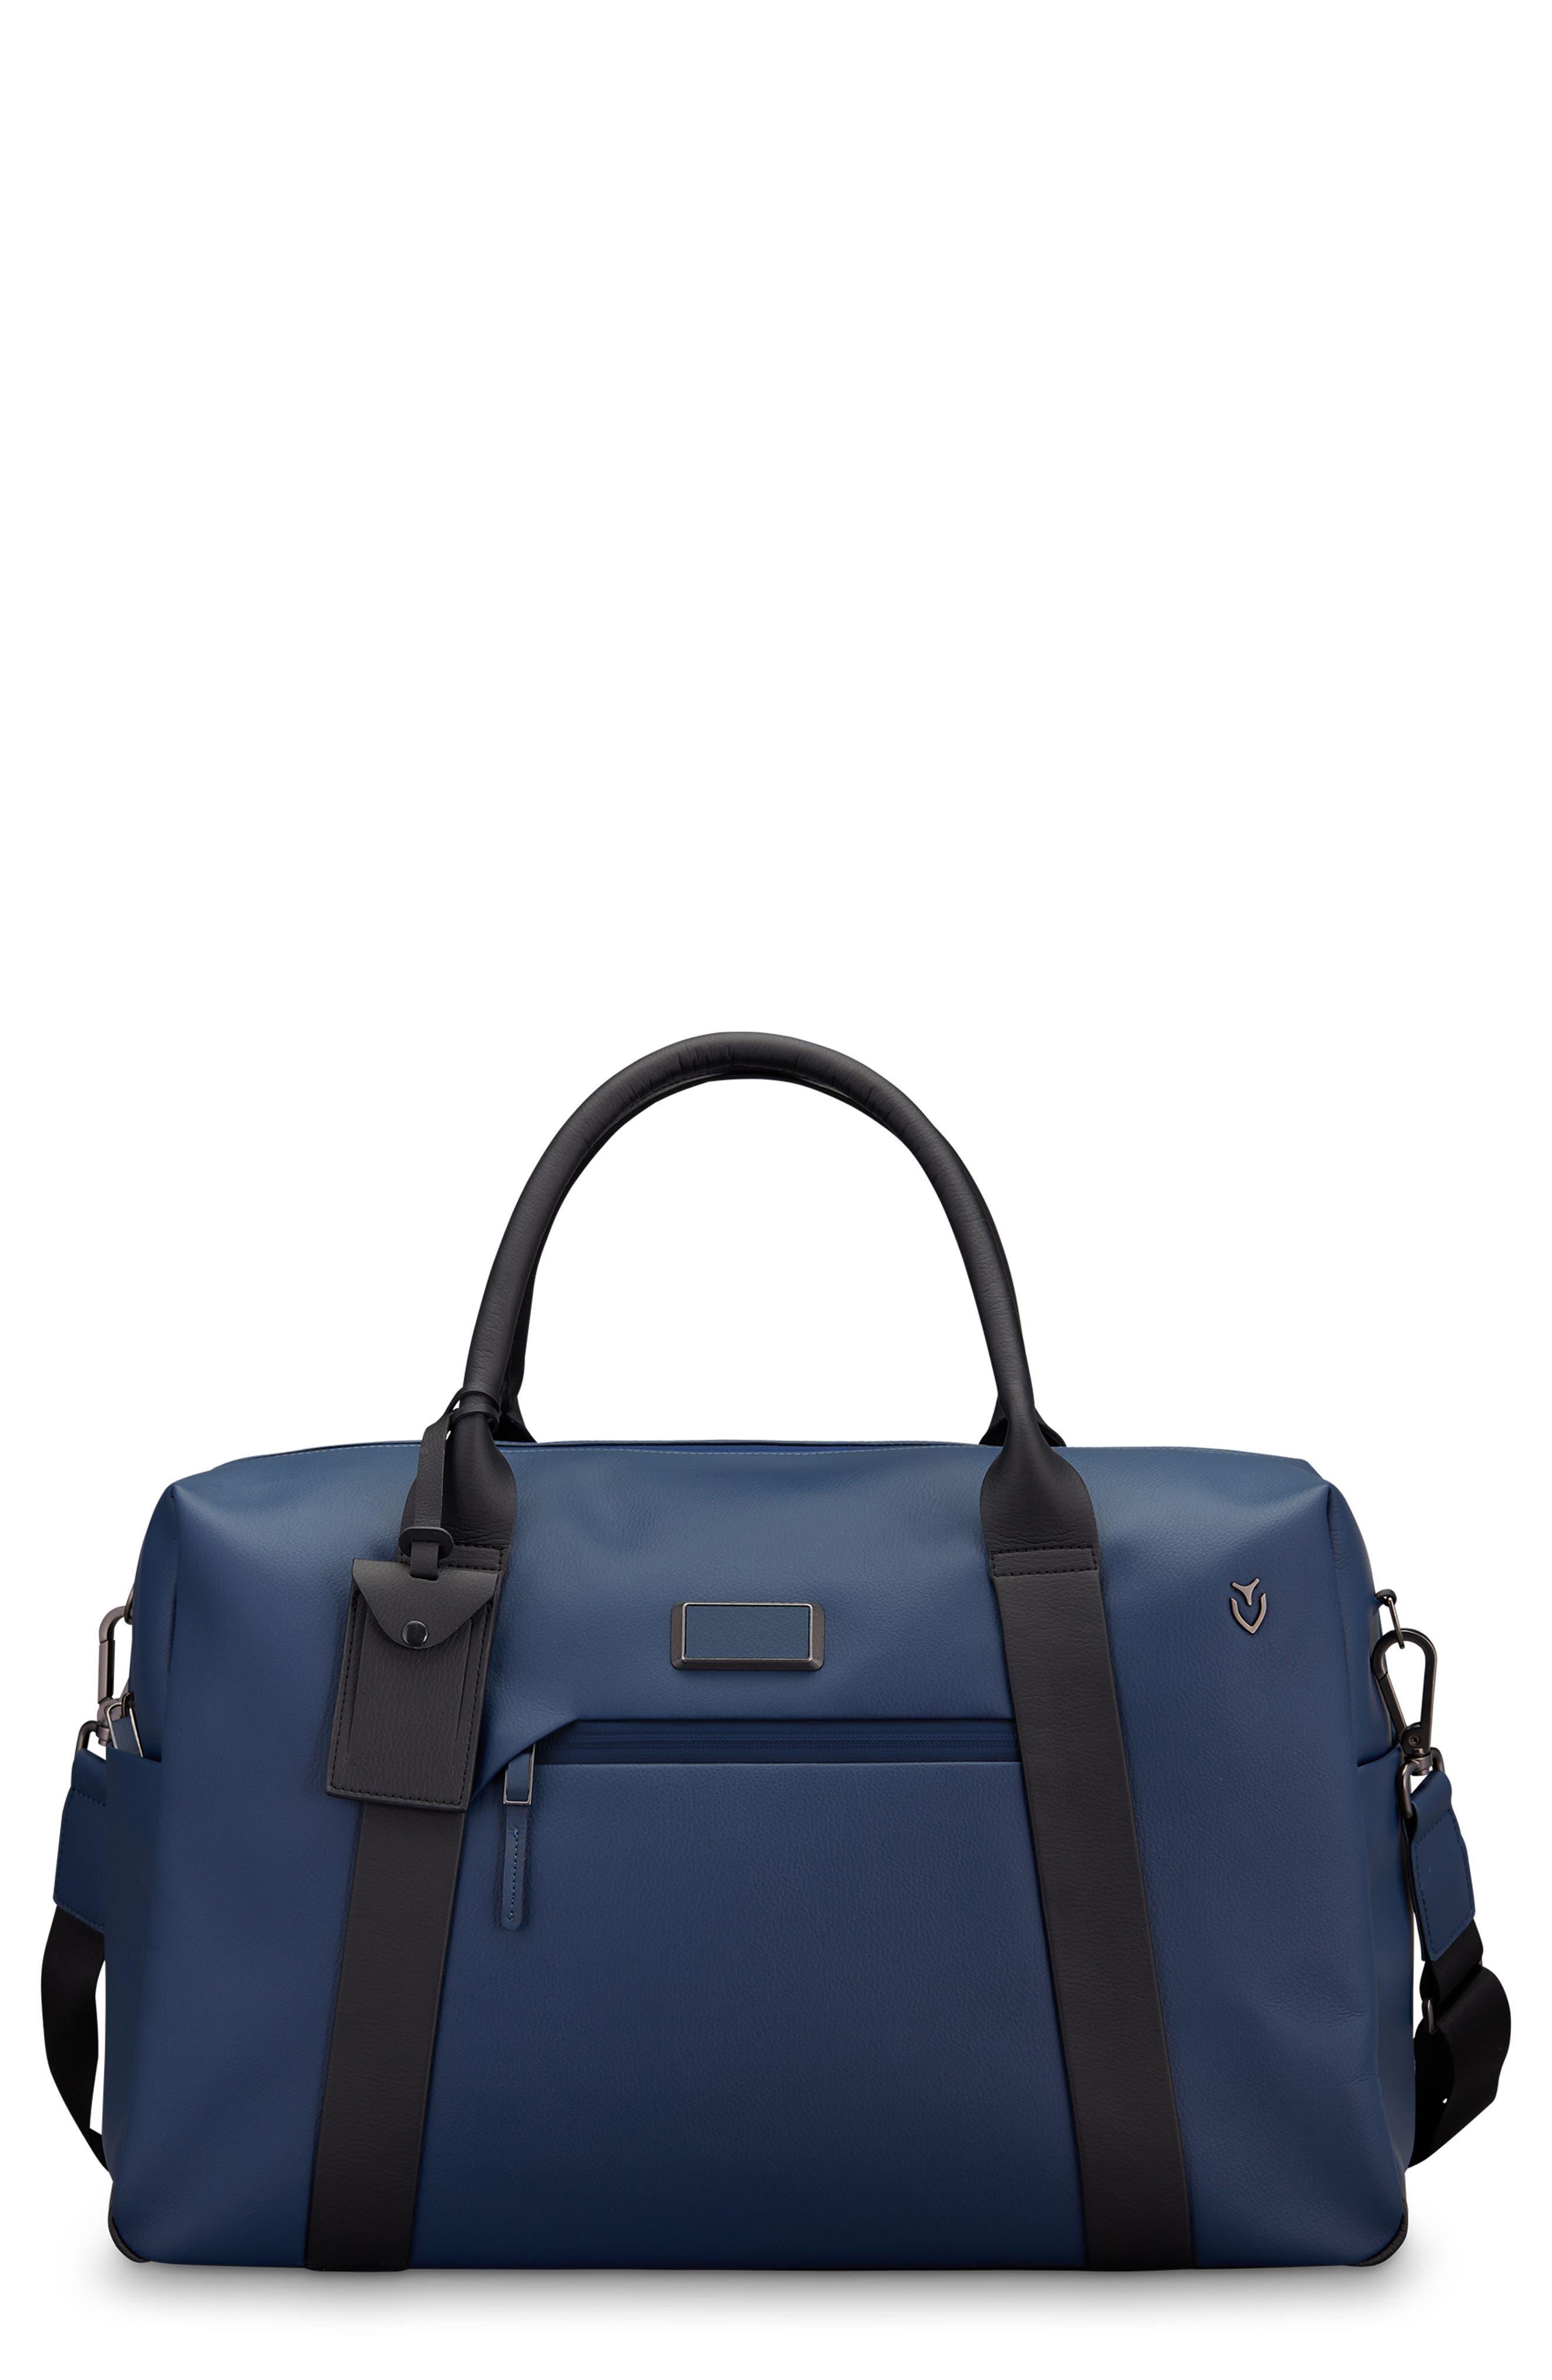 Signature 2.0 Faux Leather Duffel Bag,                         Main,                         color, PEBBLED NAVY/ BLACK